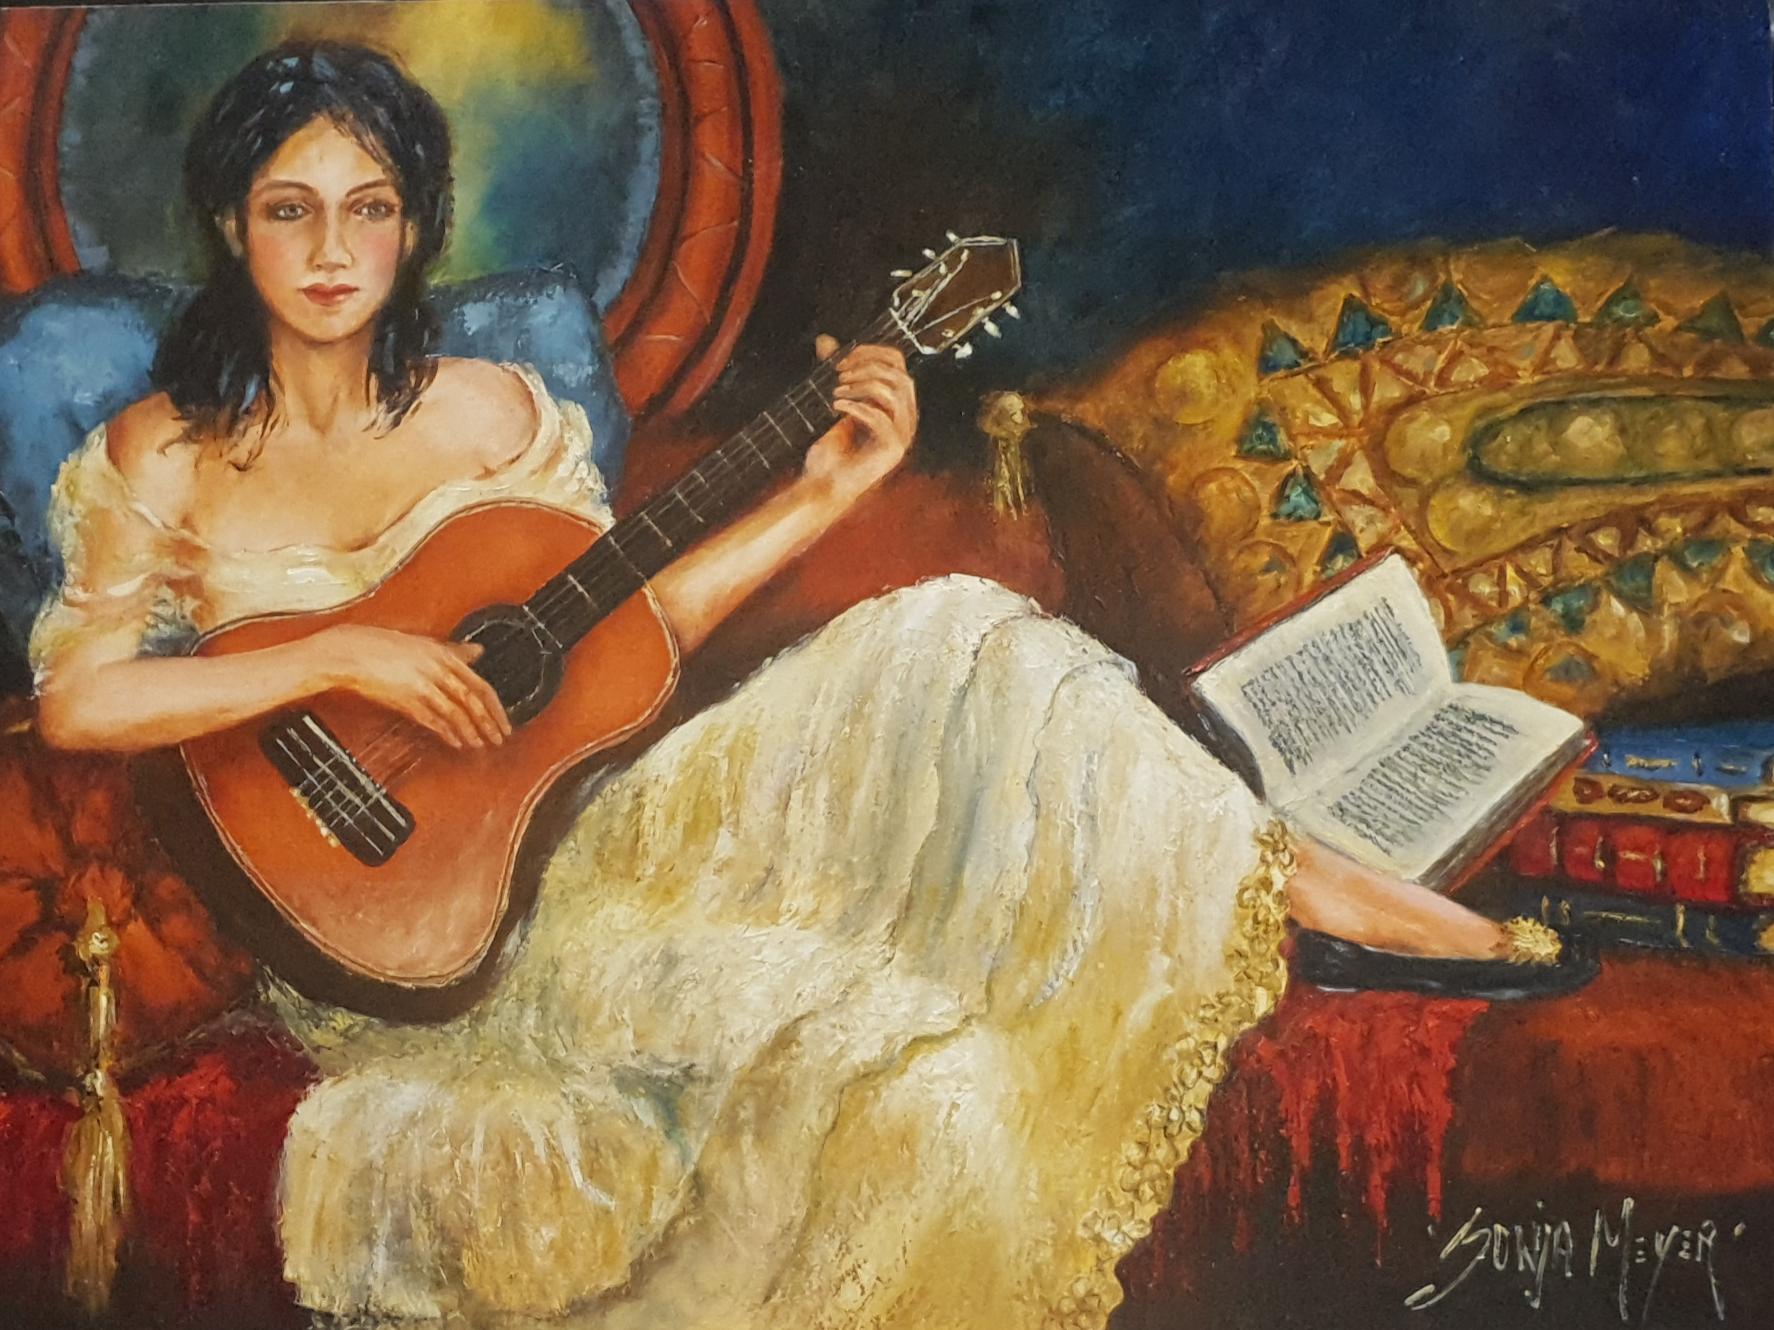 sonja guitar player 431